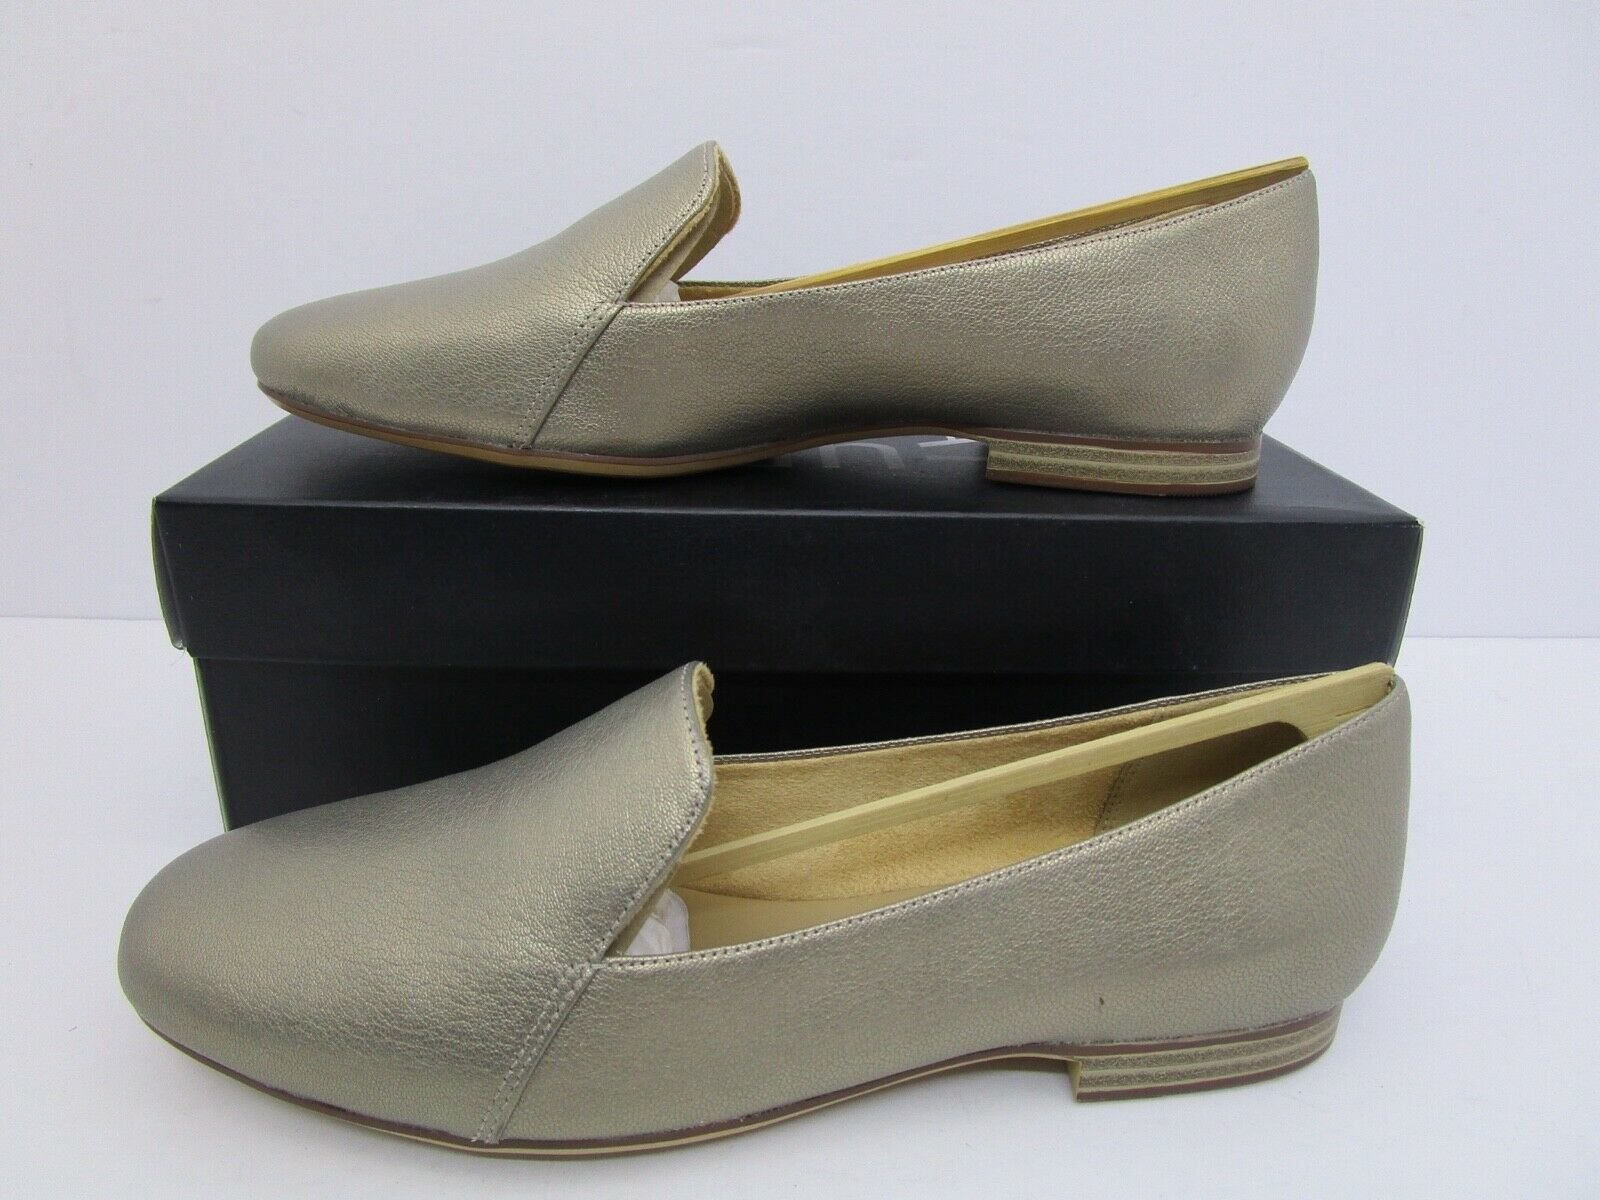 Naturalizer Emiline Women's Slip on Loafers Flats Zinc Metallic Size 8.5W